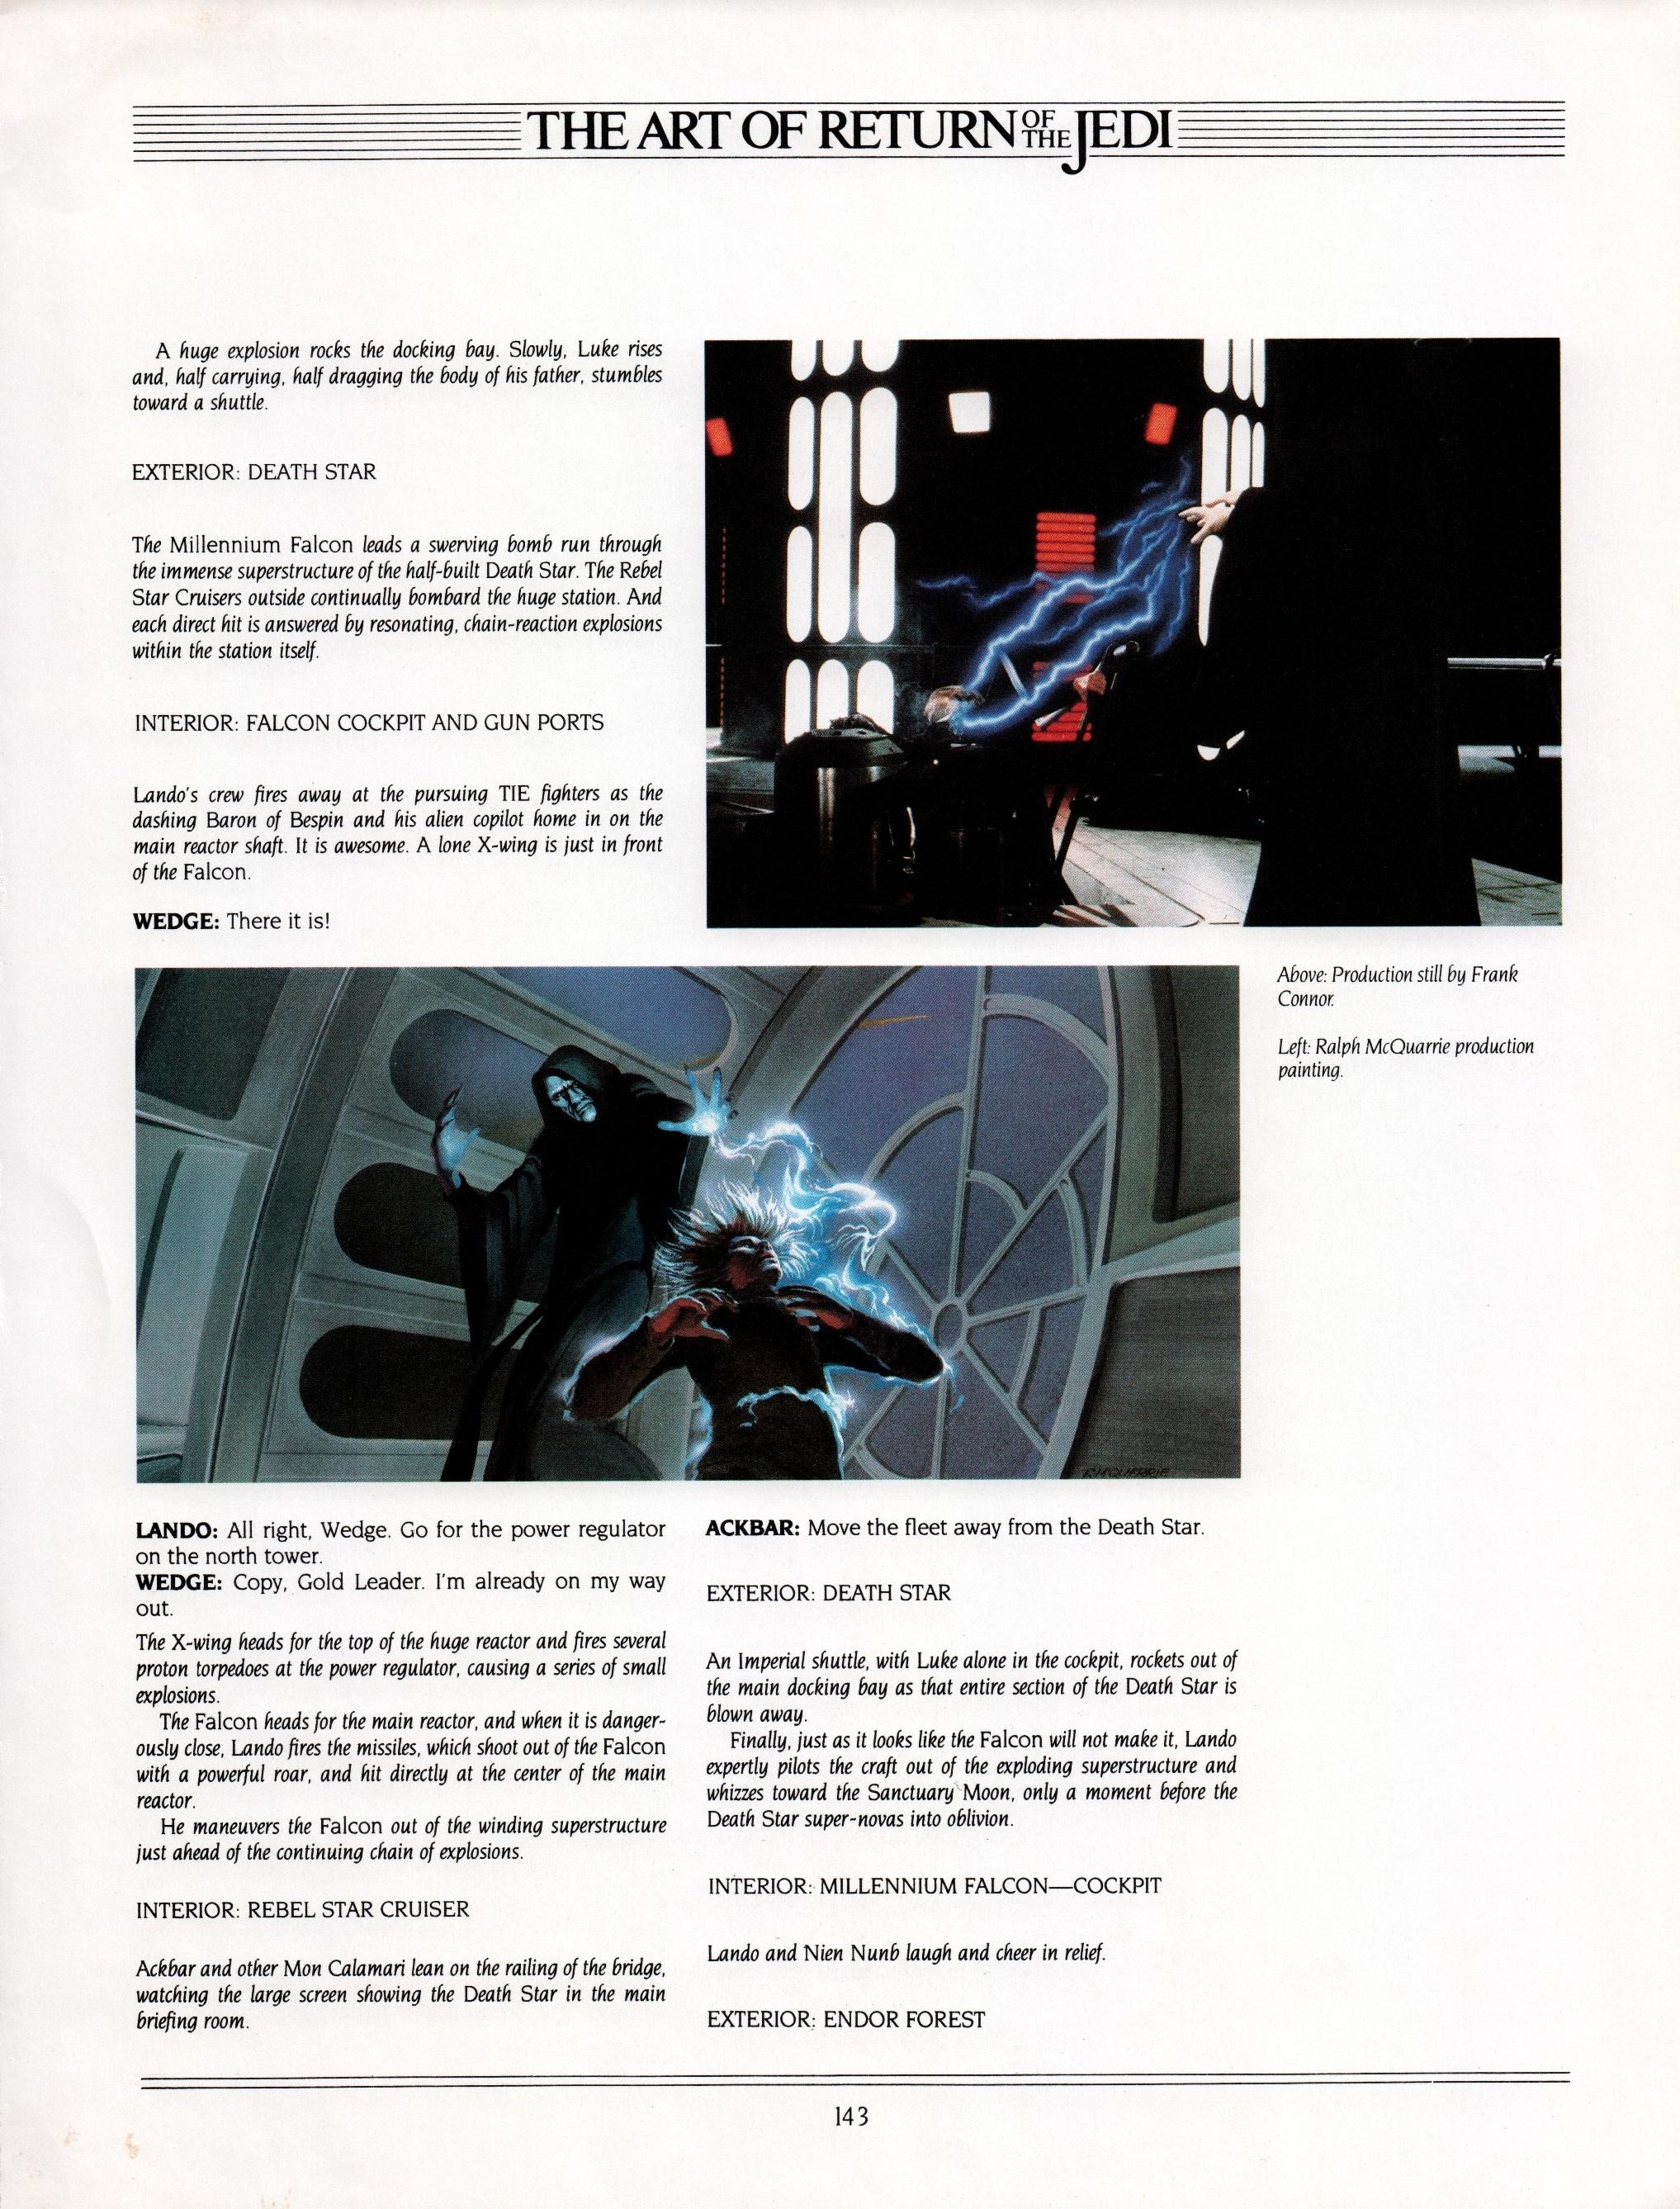 Art of Return of the Jedi (b0bafett_Empire)-p143